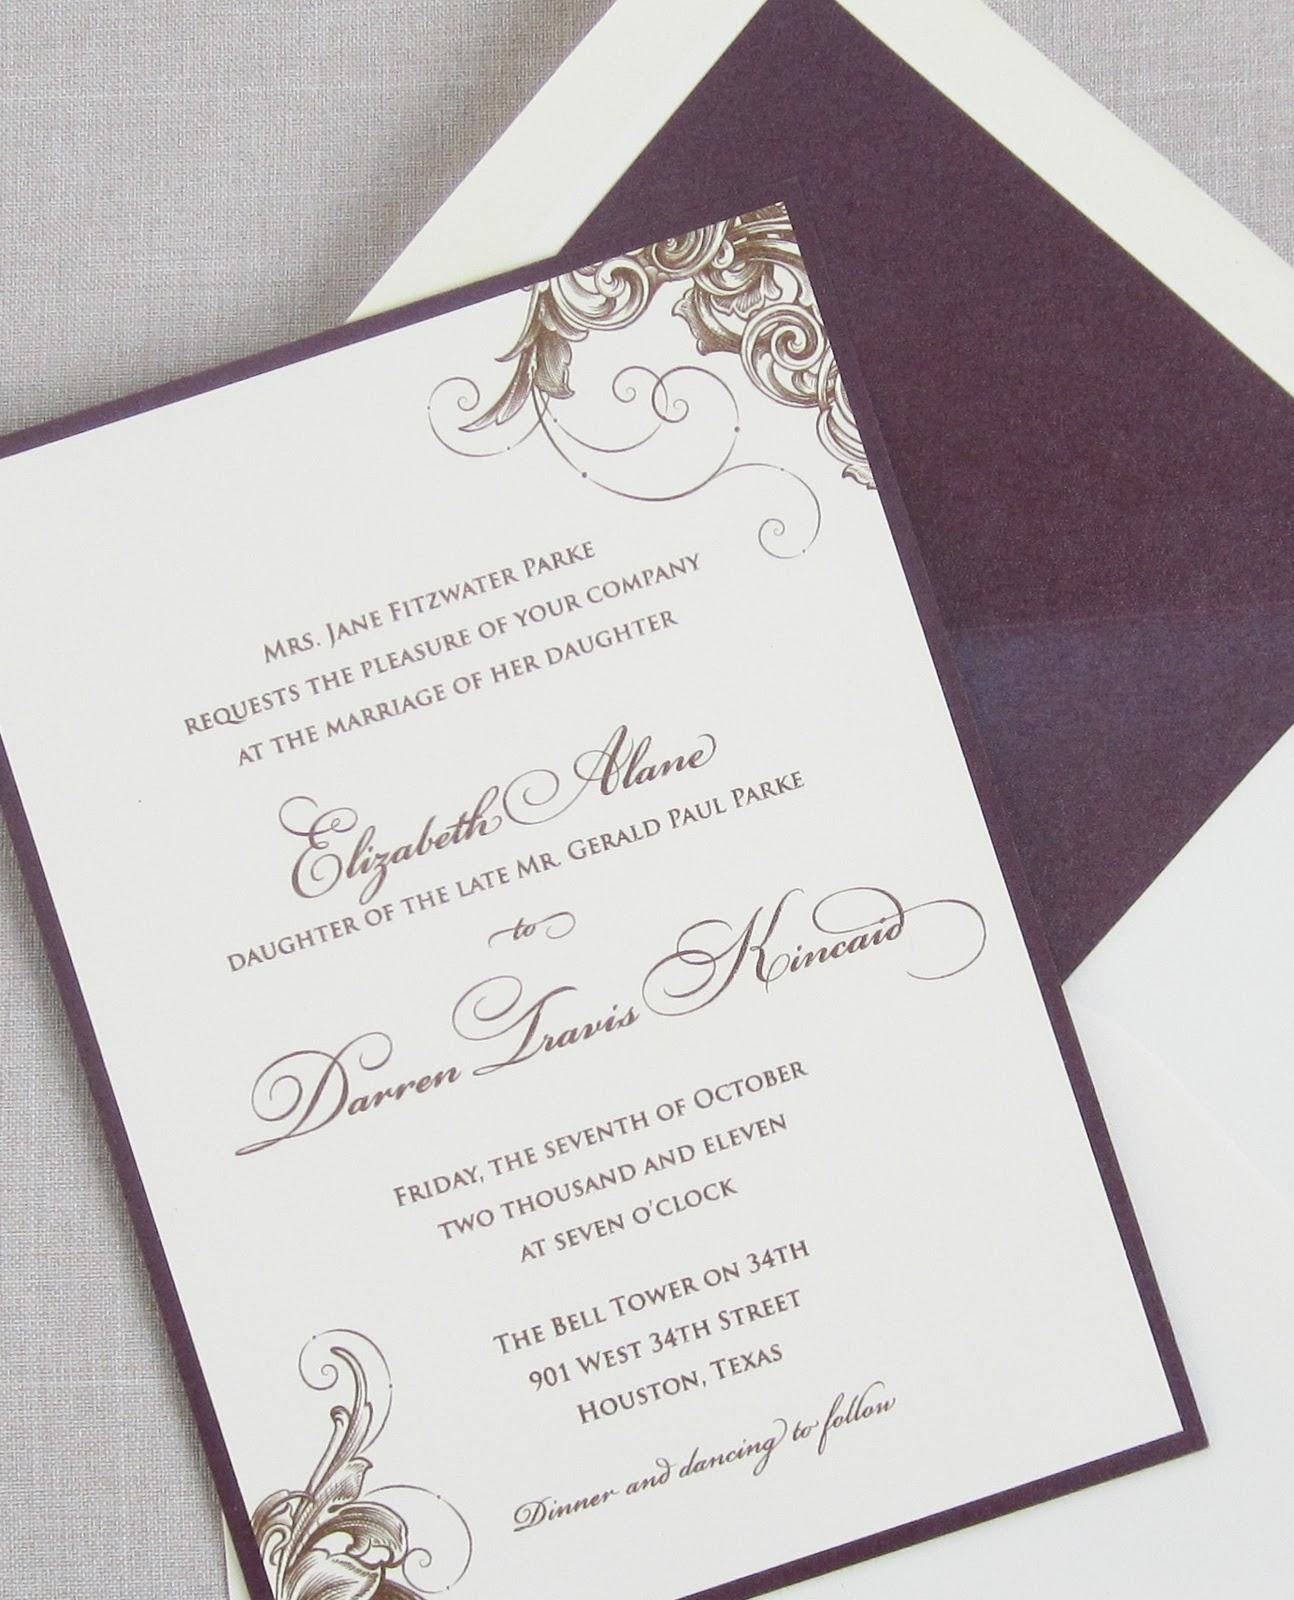 Wedding Invitation Envelope as nice invitations example